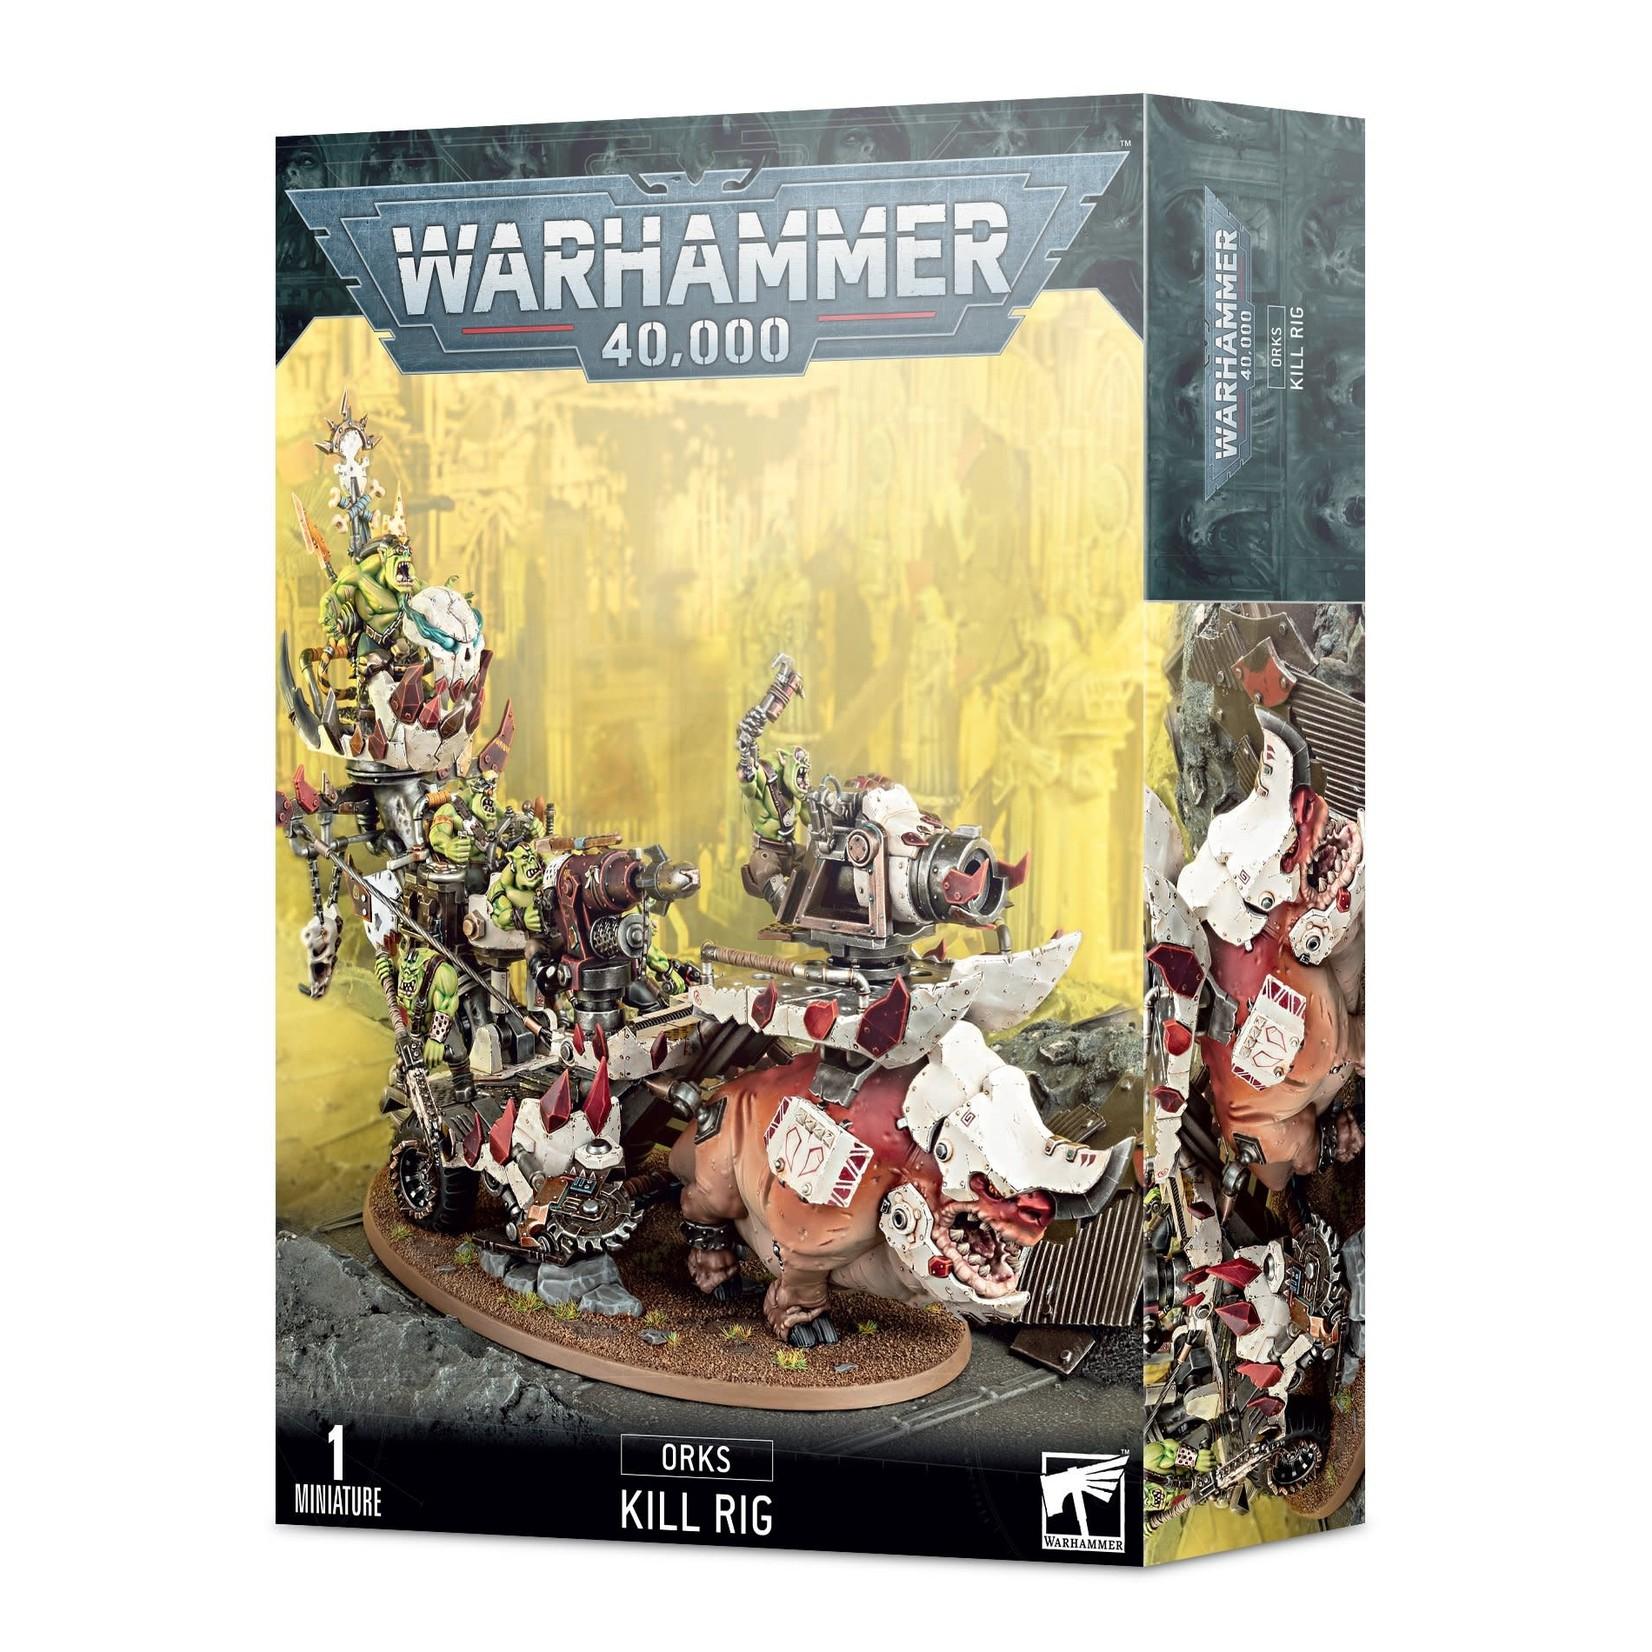 Warhammer 40K Orks - Kill Rig